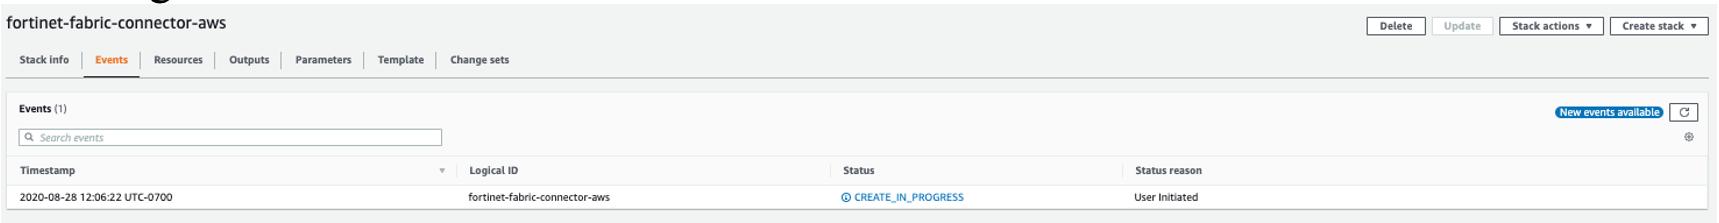 fortinet stack creation in progress screenshot